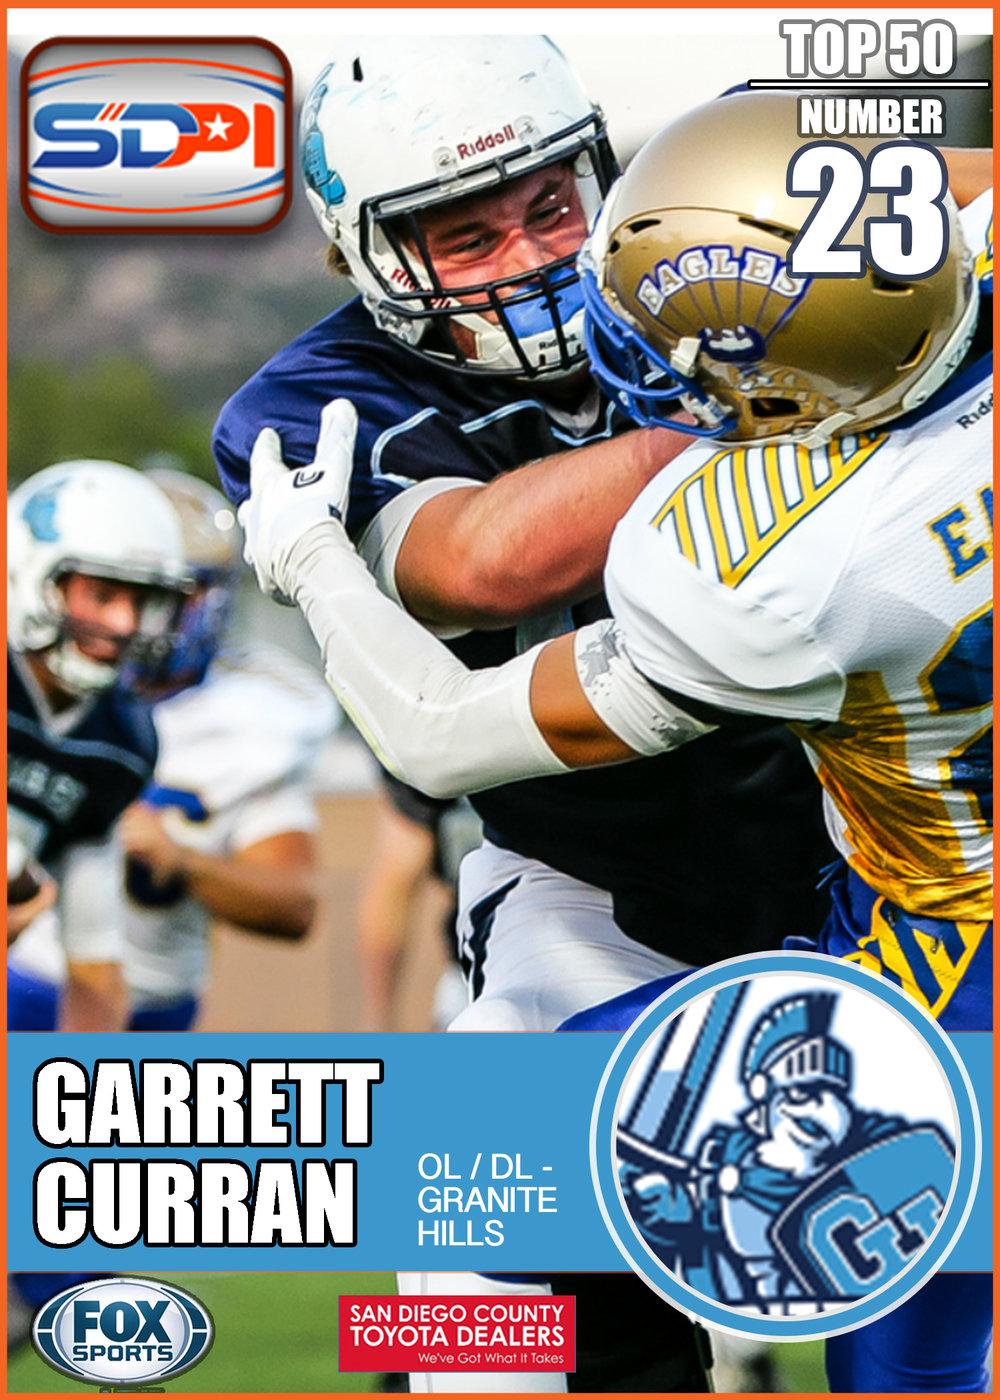 - Garrett is an upper echelon run-blocker who makes running backs' jobs much easier with the vast holes he creates. This 6'5